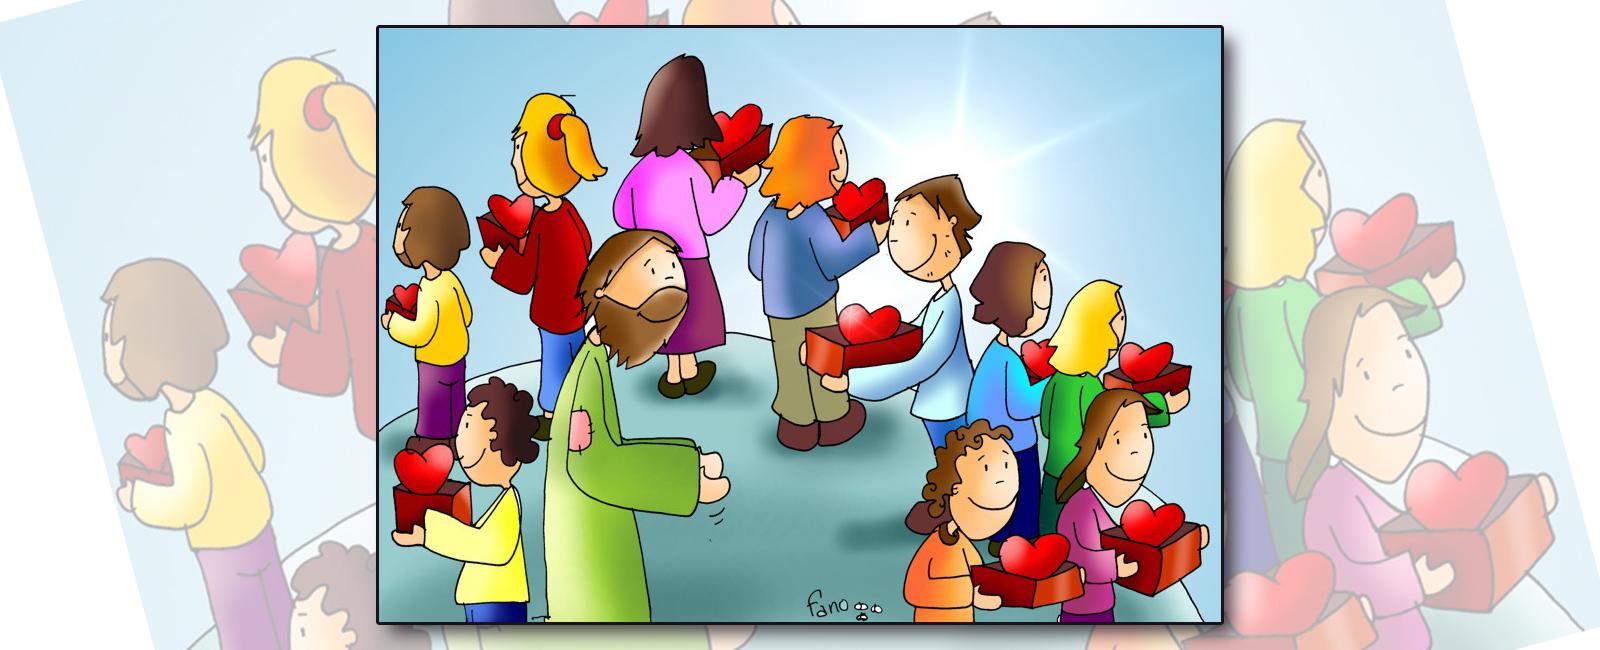 Parroquia El Altet - Evangelio Domingo 19 de Mayo 2019